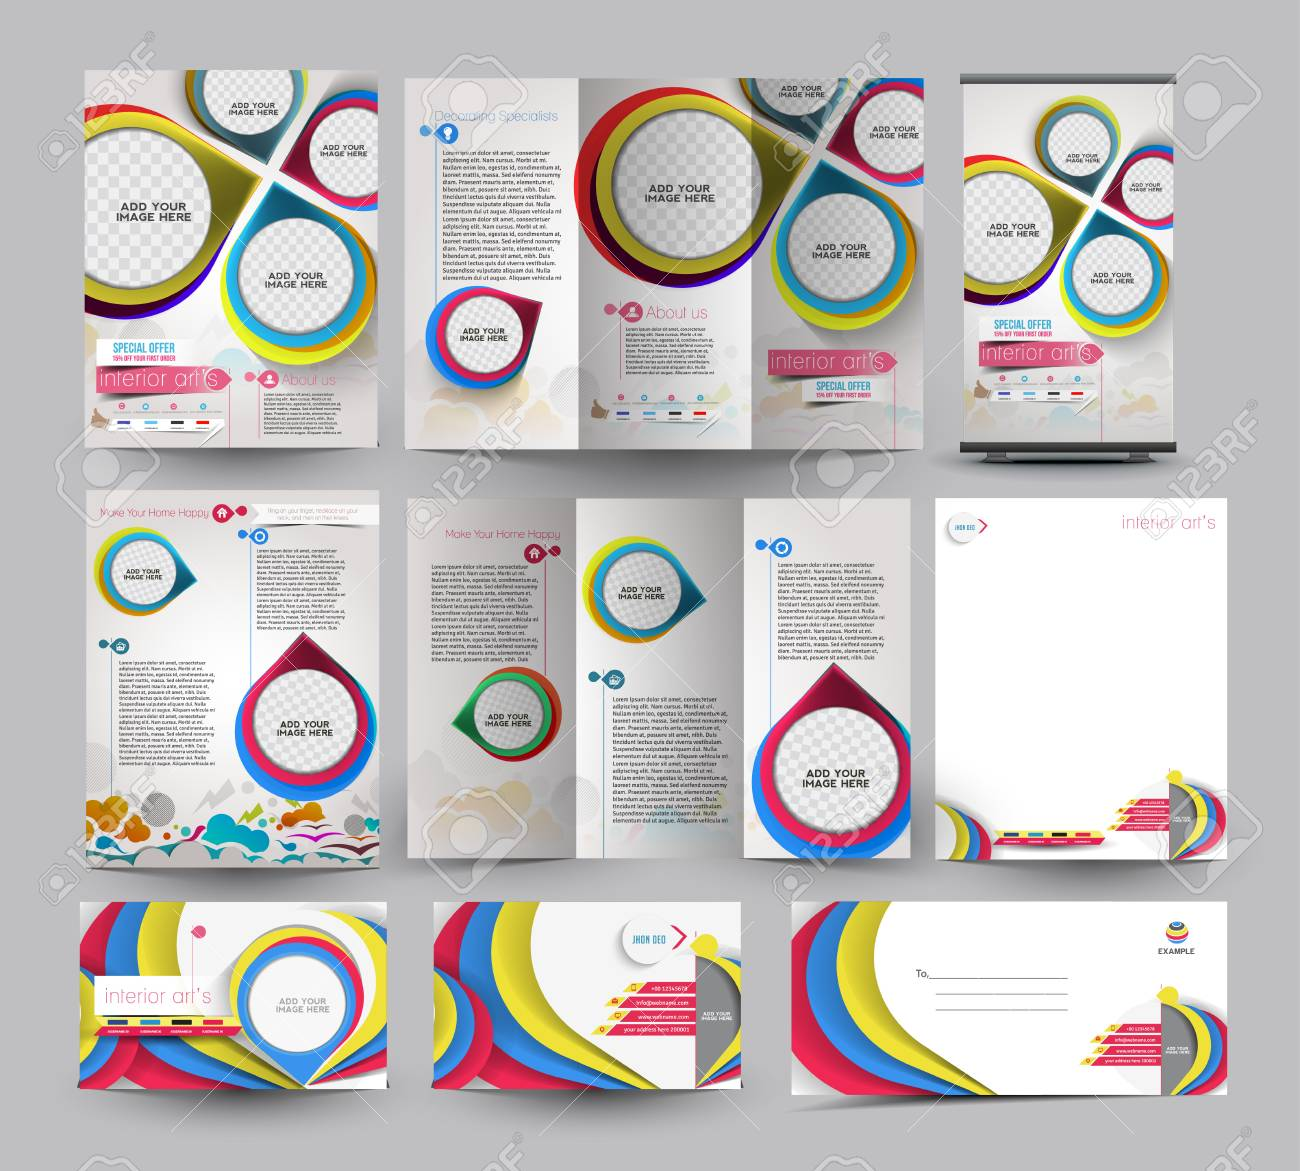 Interior Designer Business Stationery Set Template. - 41833674